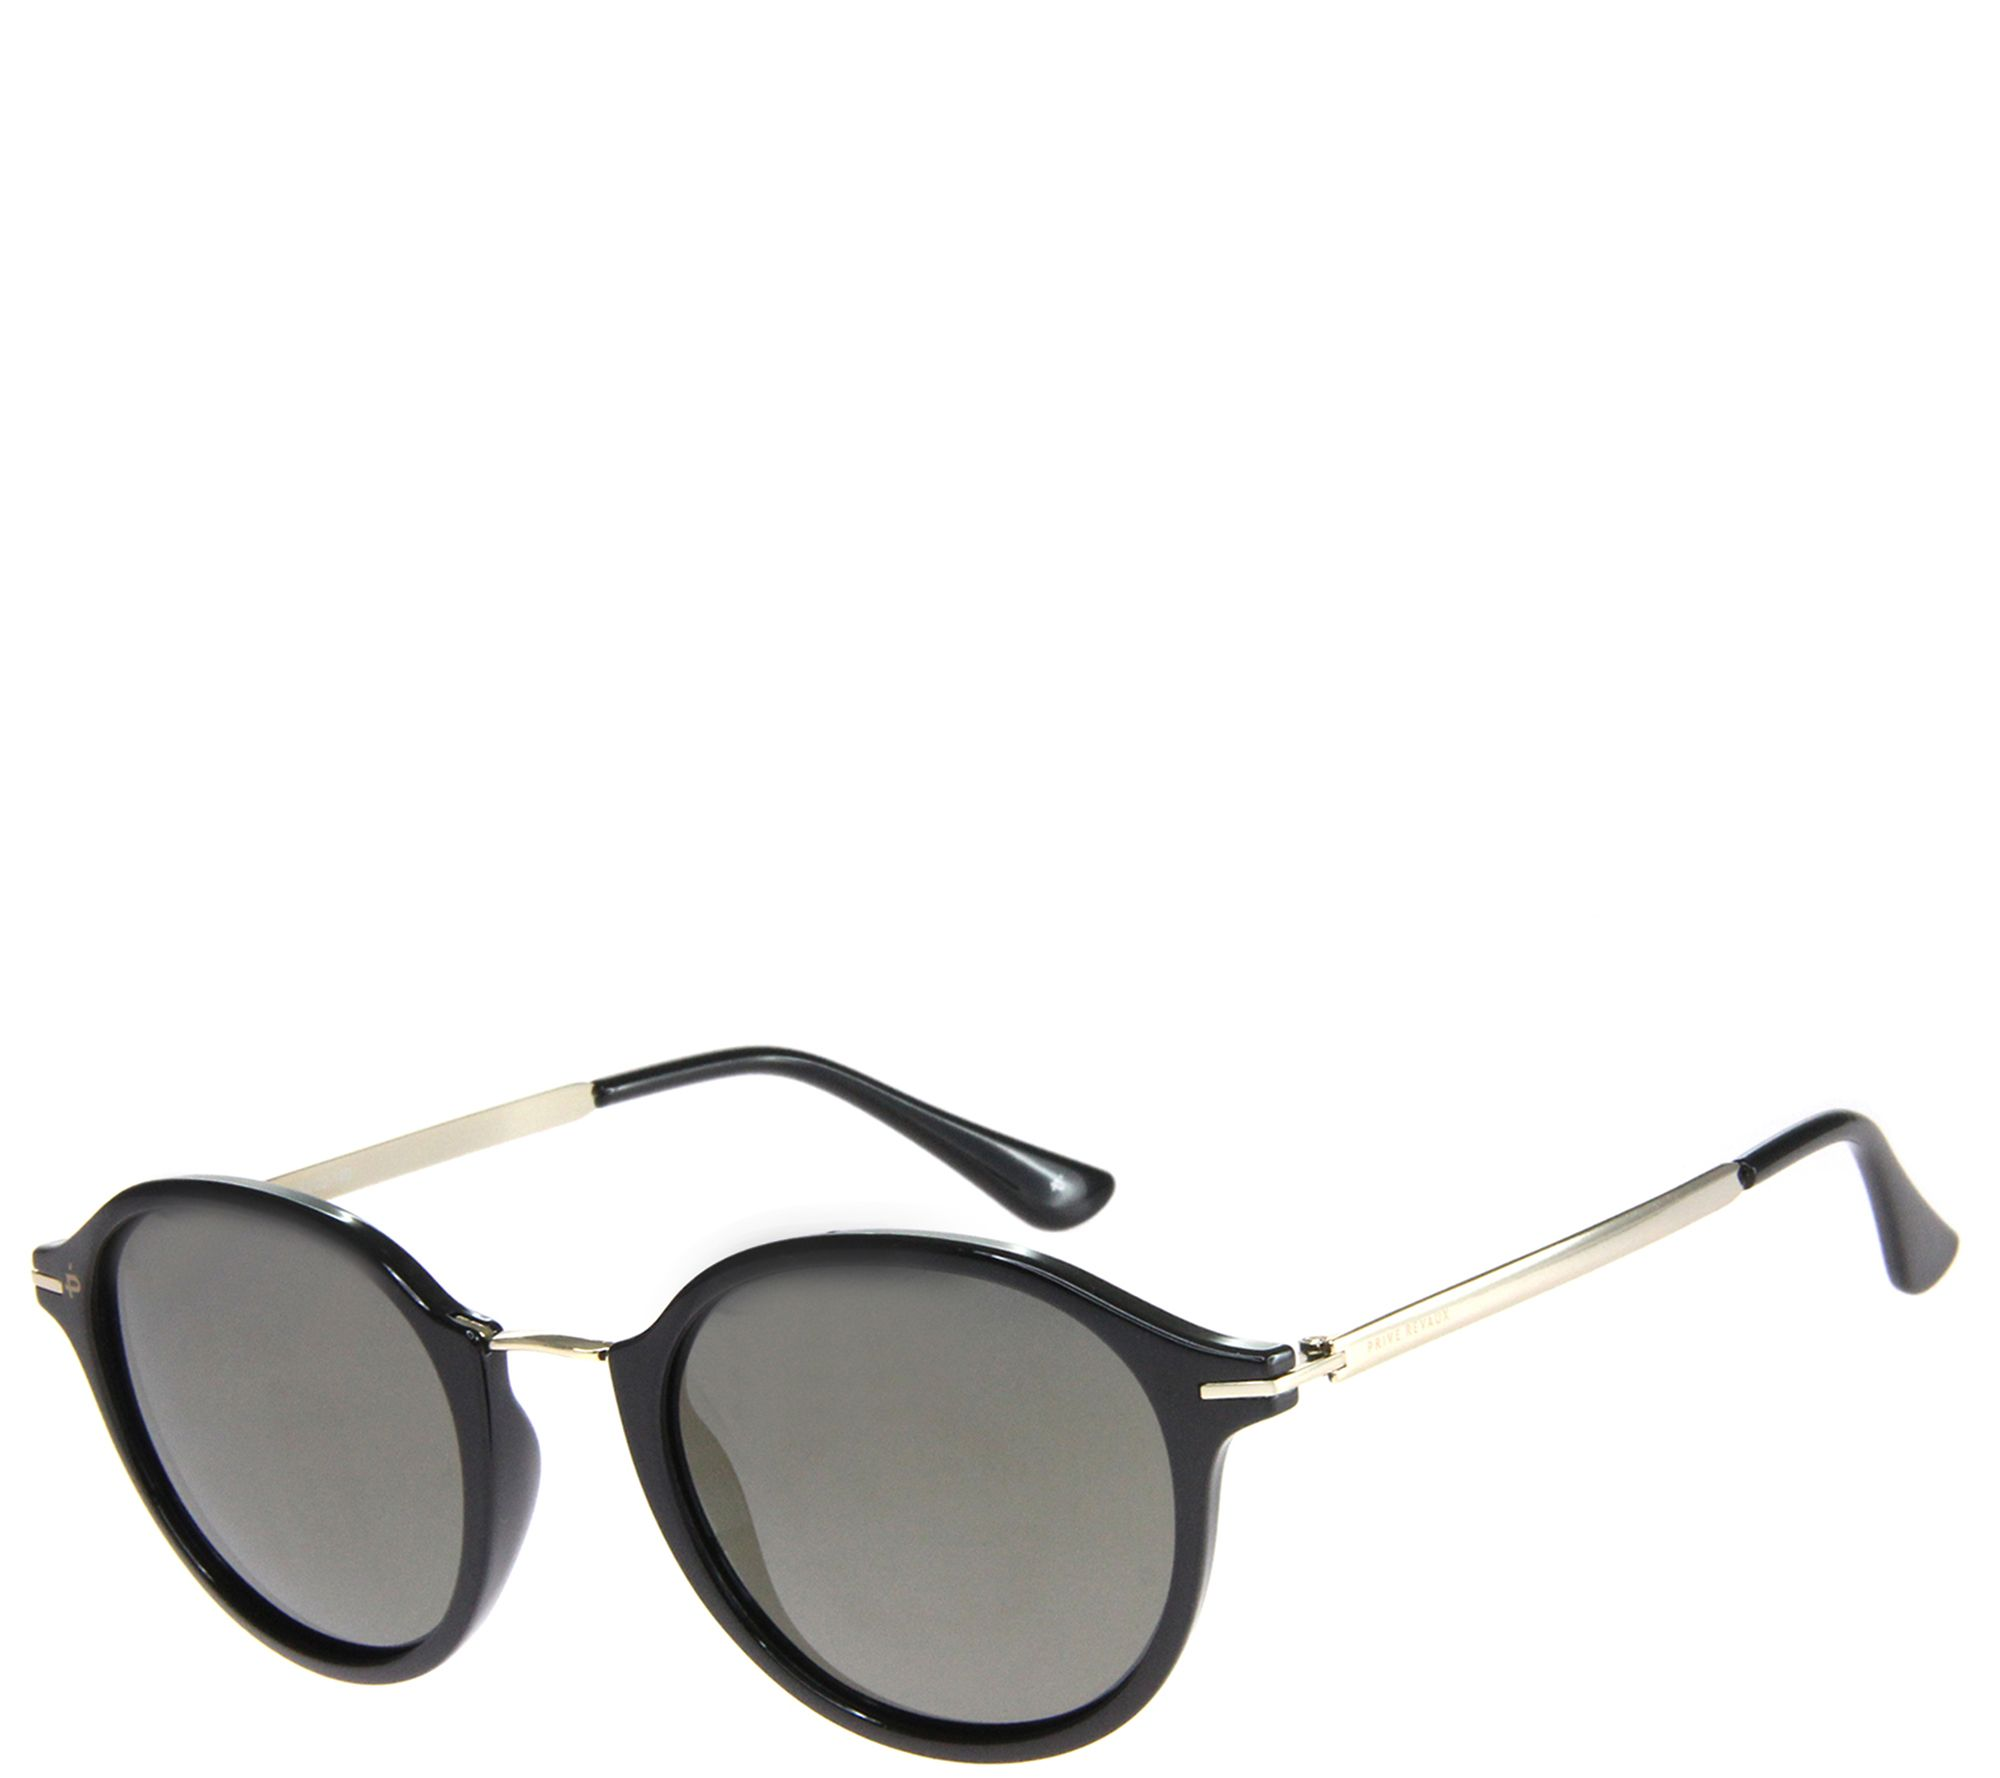 59bc510d52f Prive Revaux The Penn Polarized Sunglasses - Black Smoke - Page 1 — QVC.com